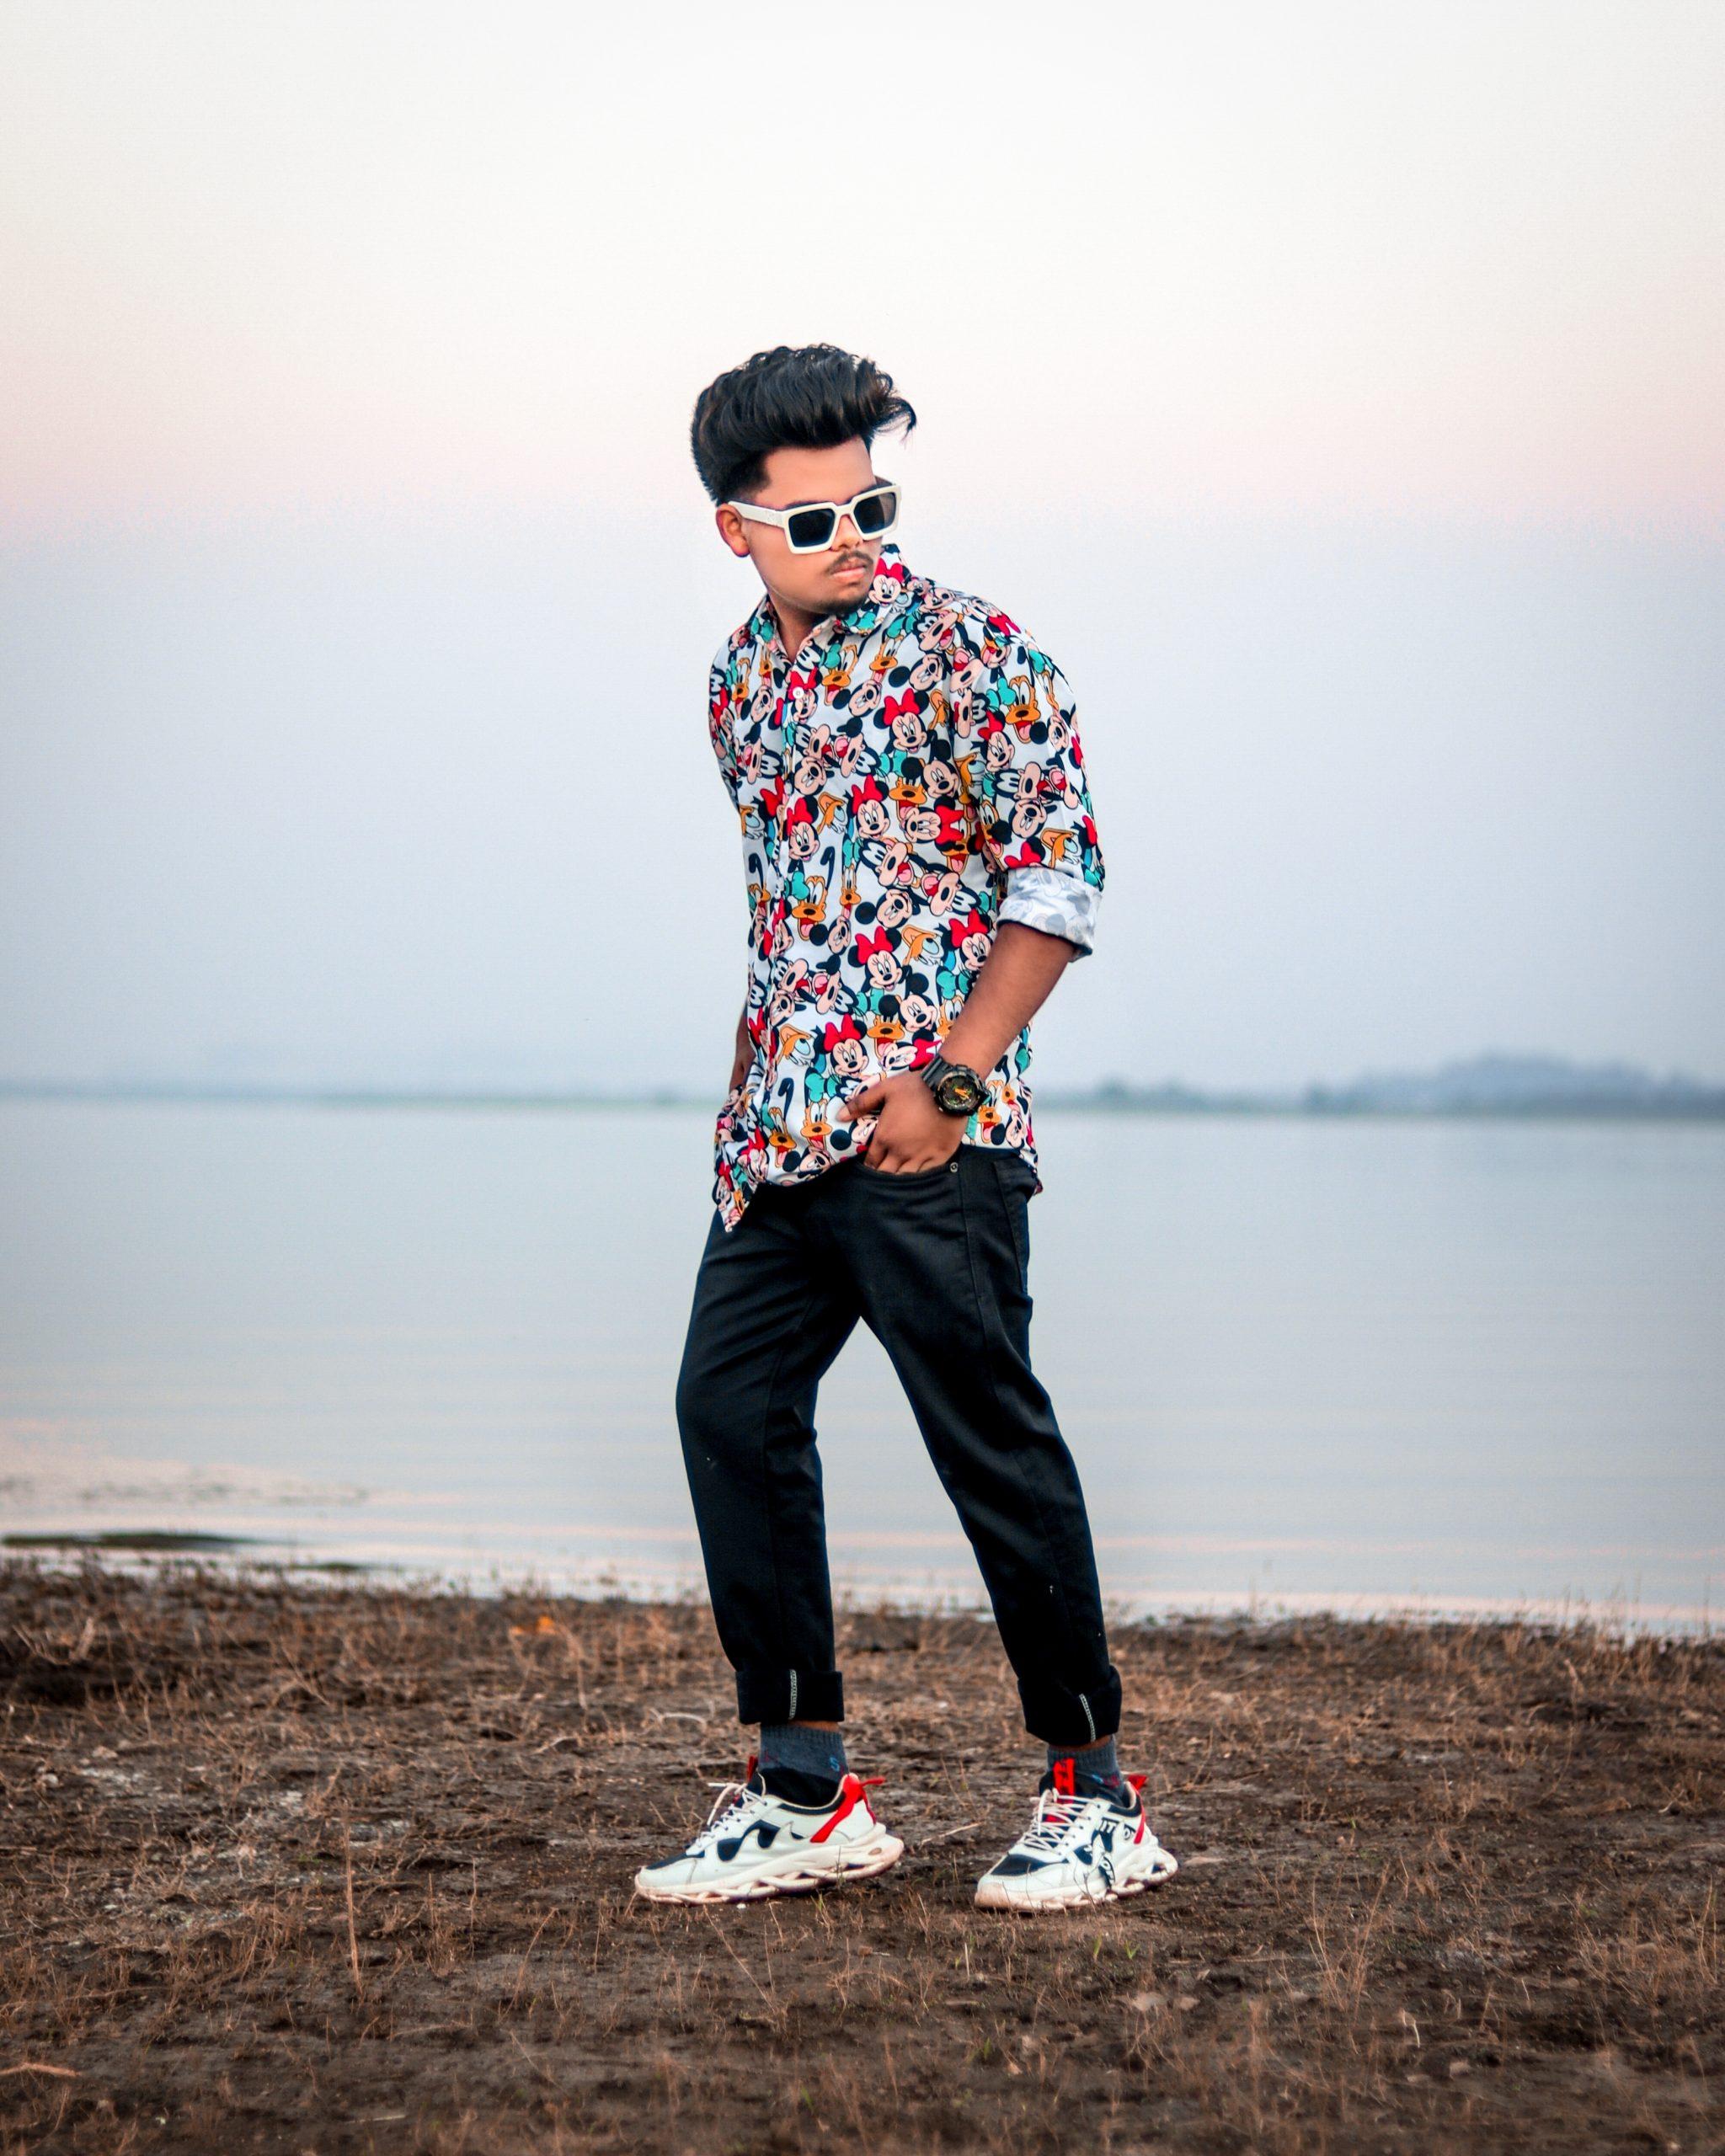 Stylish boy posing near the river